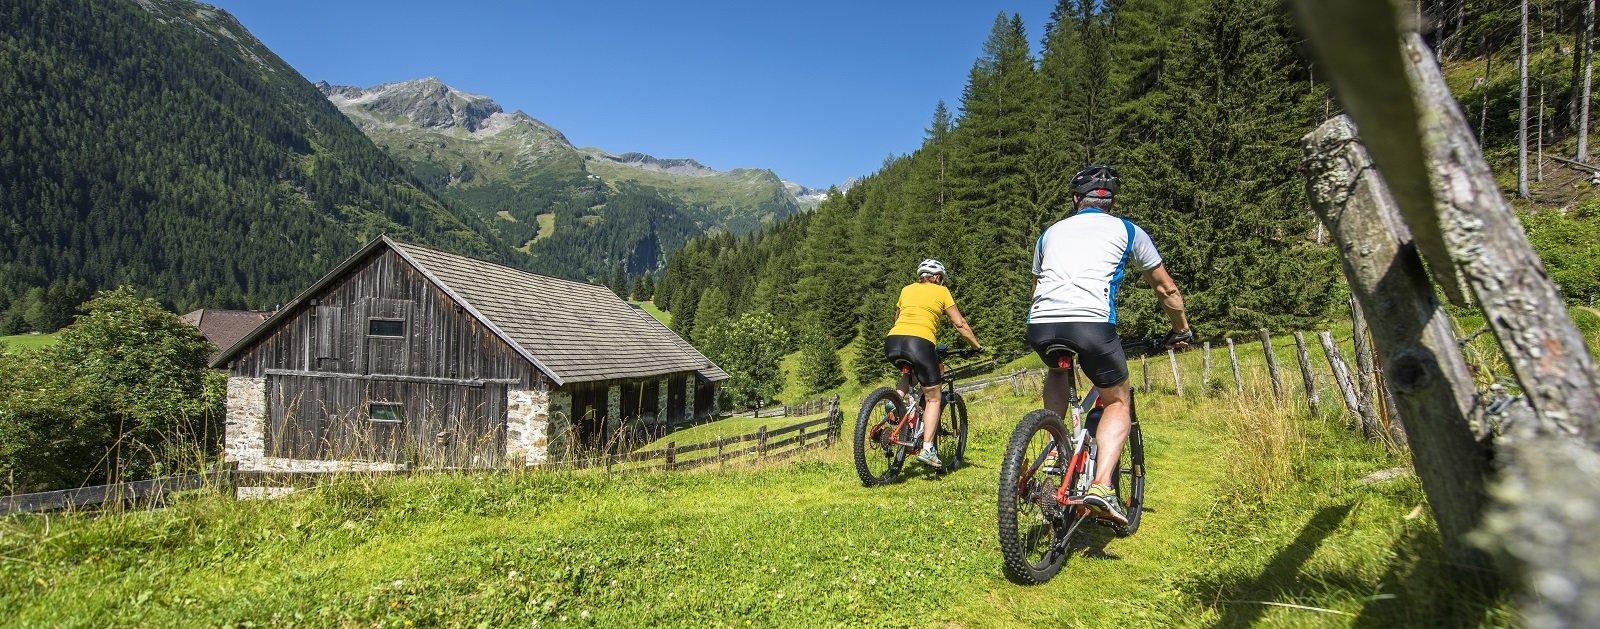 Mountainbiken in Mallnitz (c) Dietmar Denger